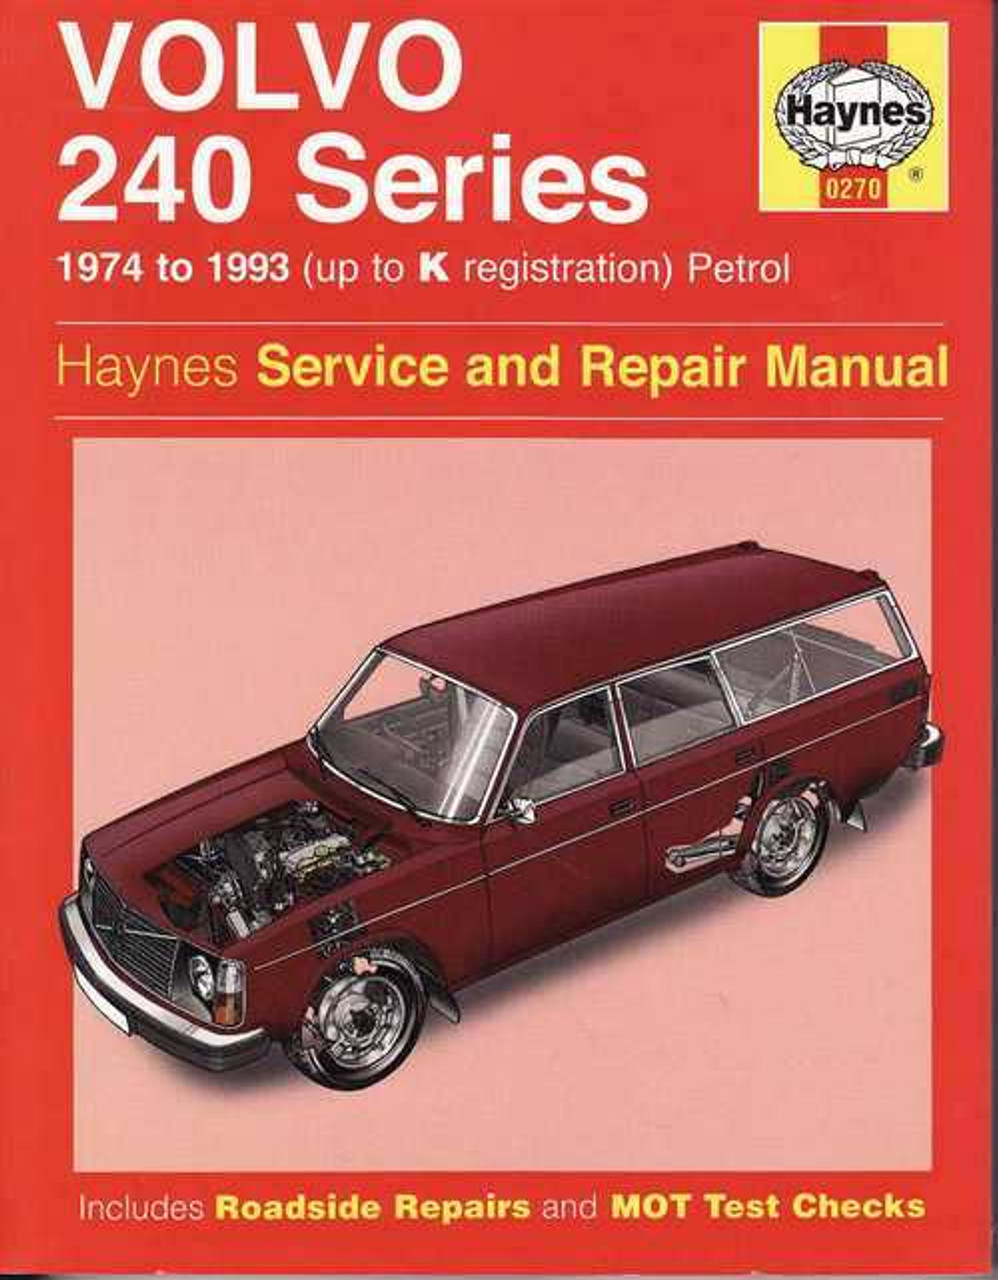 93 volvo 240 haynes manual open source user manual u2022 rh dramatic varieties com 1997 Volvo 850 Vacuum Line Diagram Volvo 850 Fuel Pump Relay Location